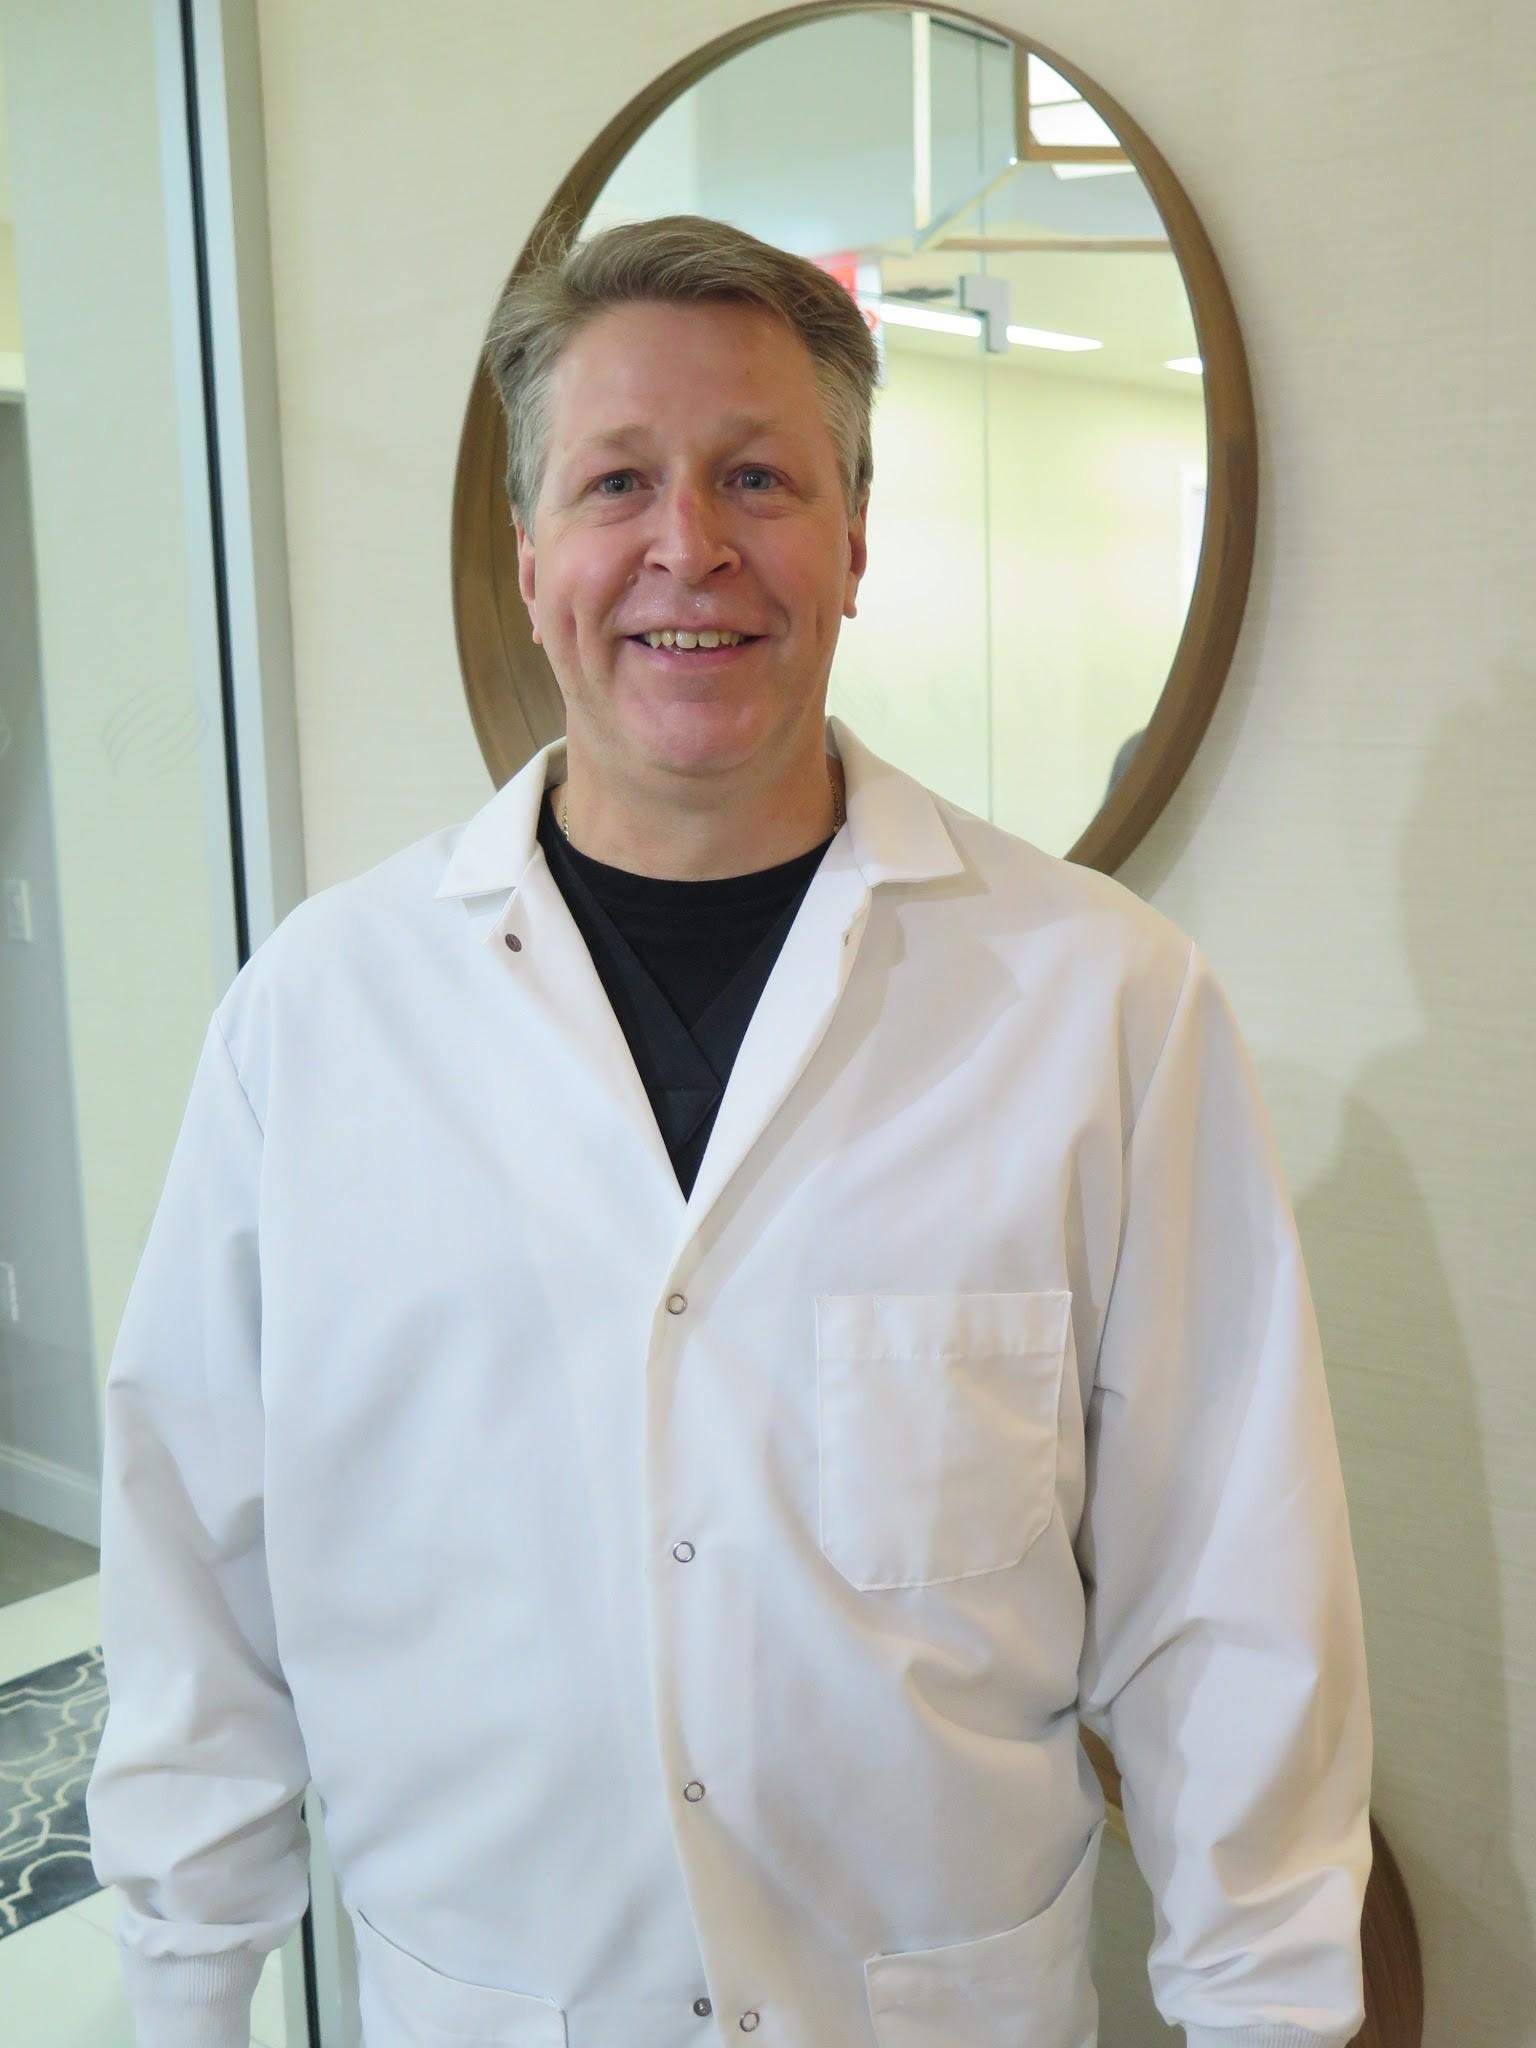 Dr. Michael Kelley, D.D.S.